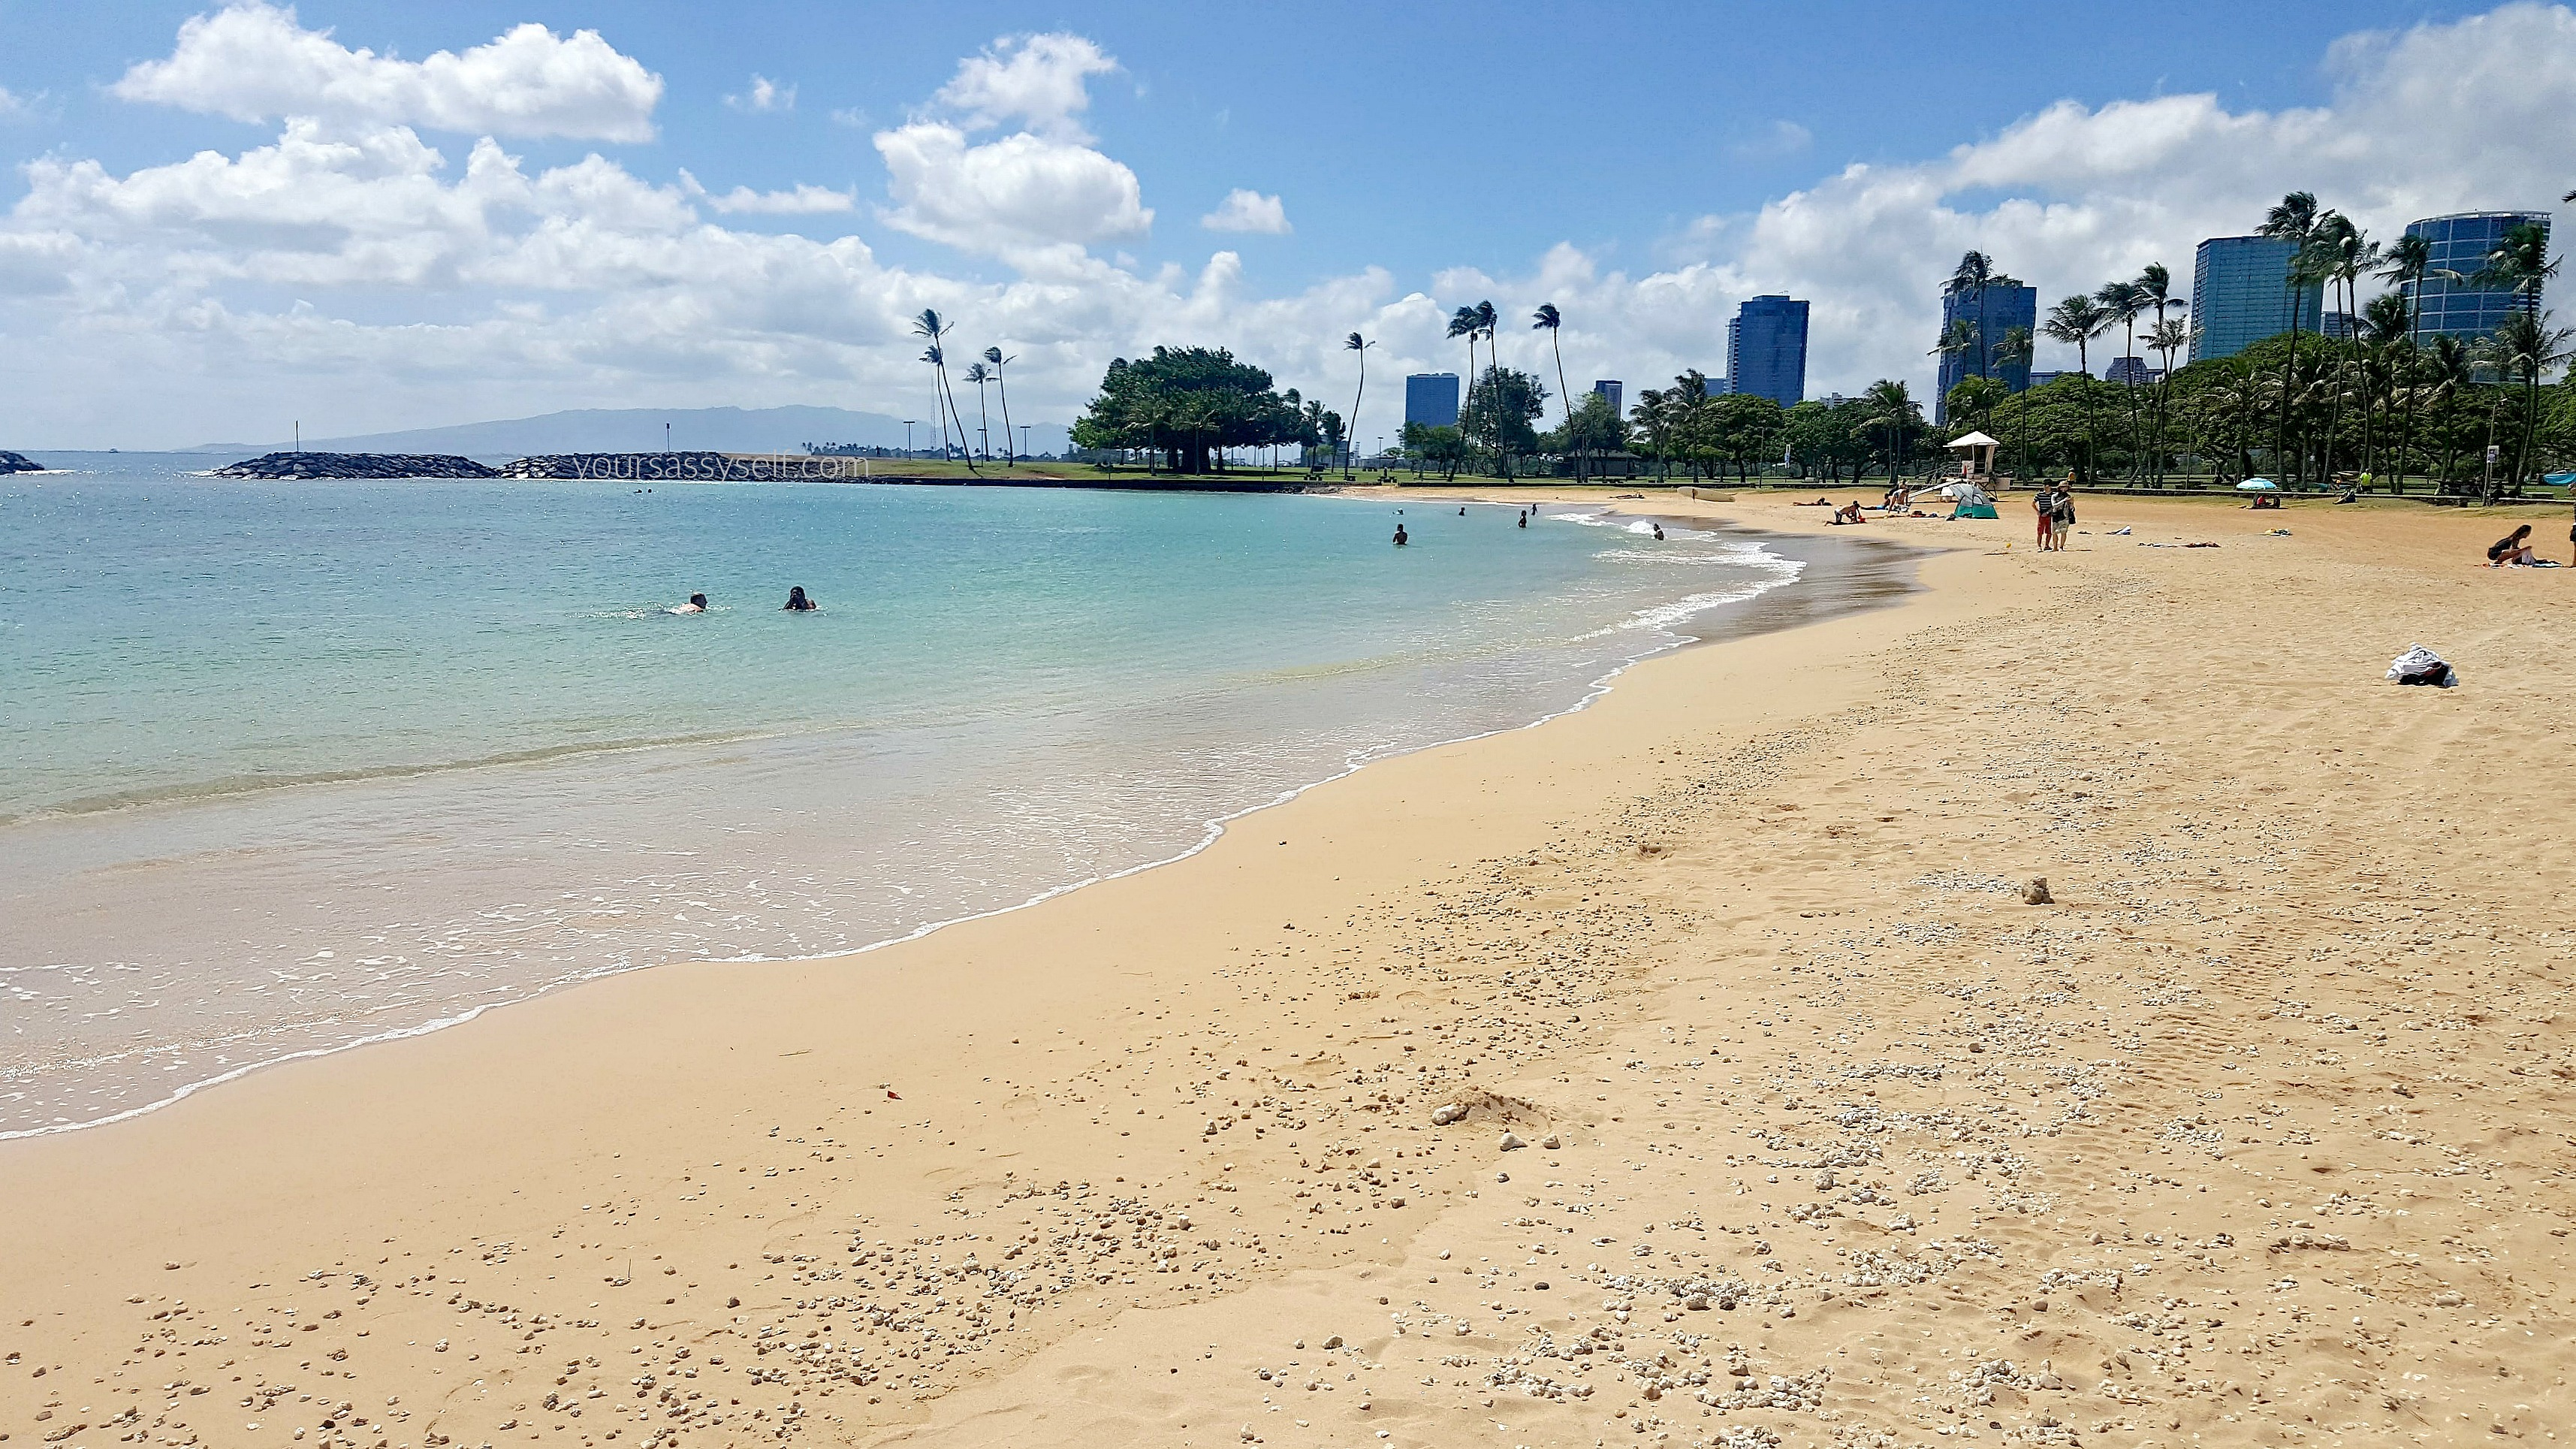 Magic Island Beach - yoursassyself.com